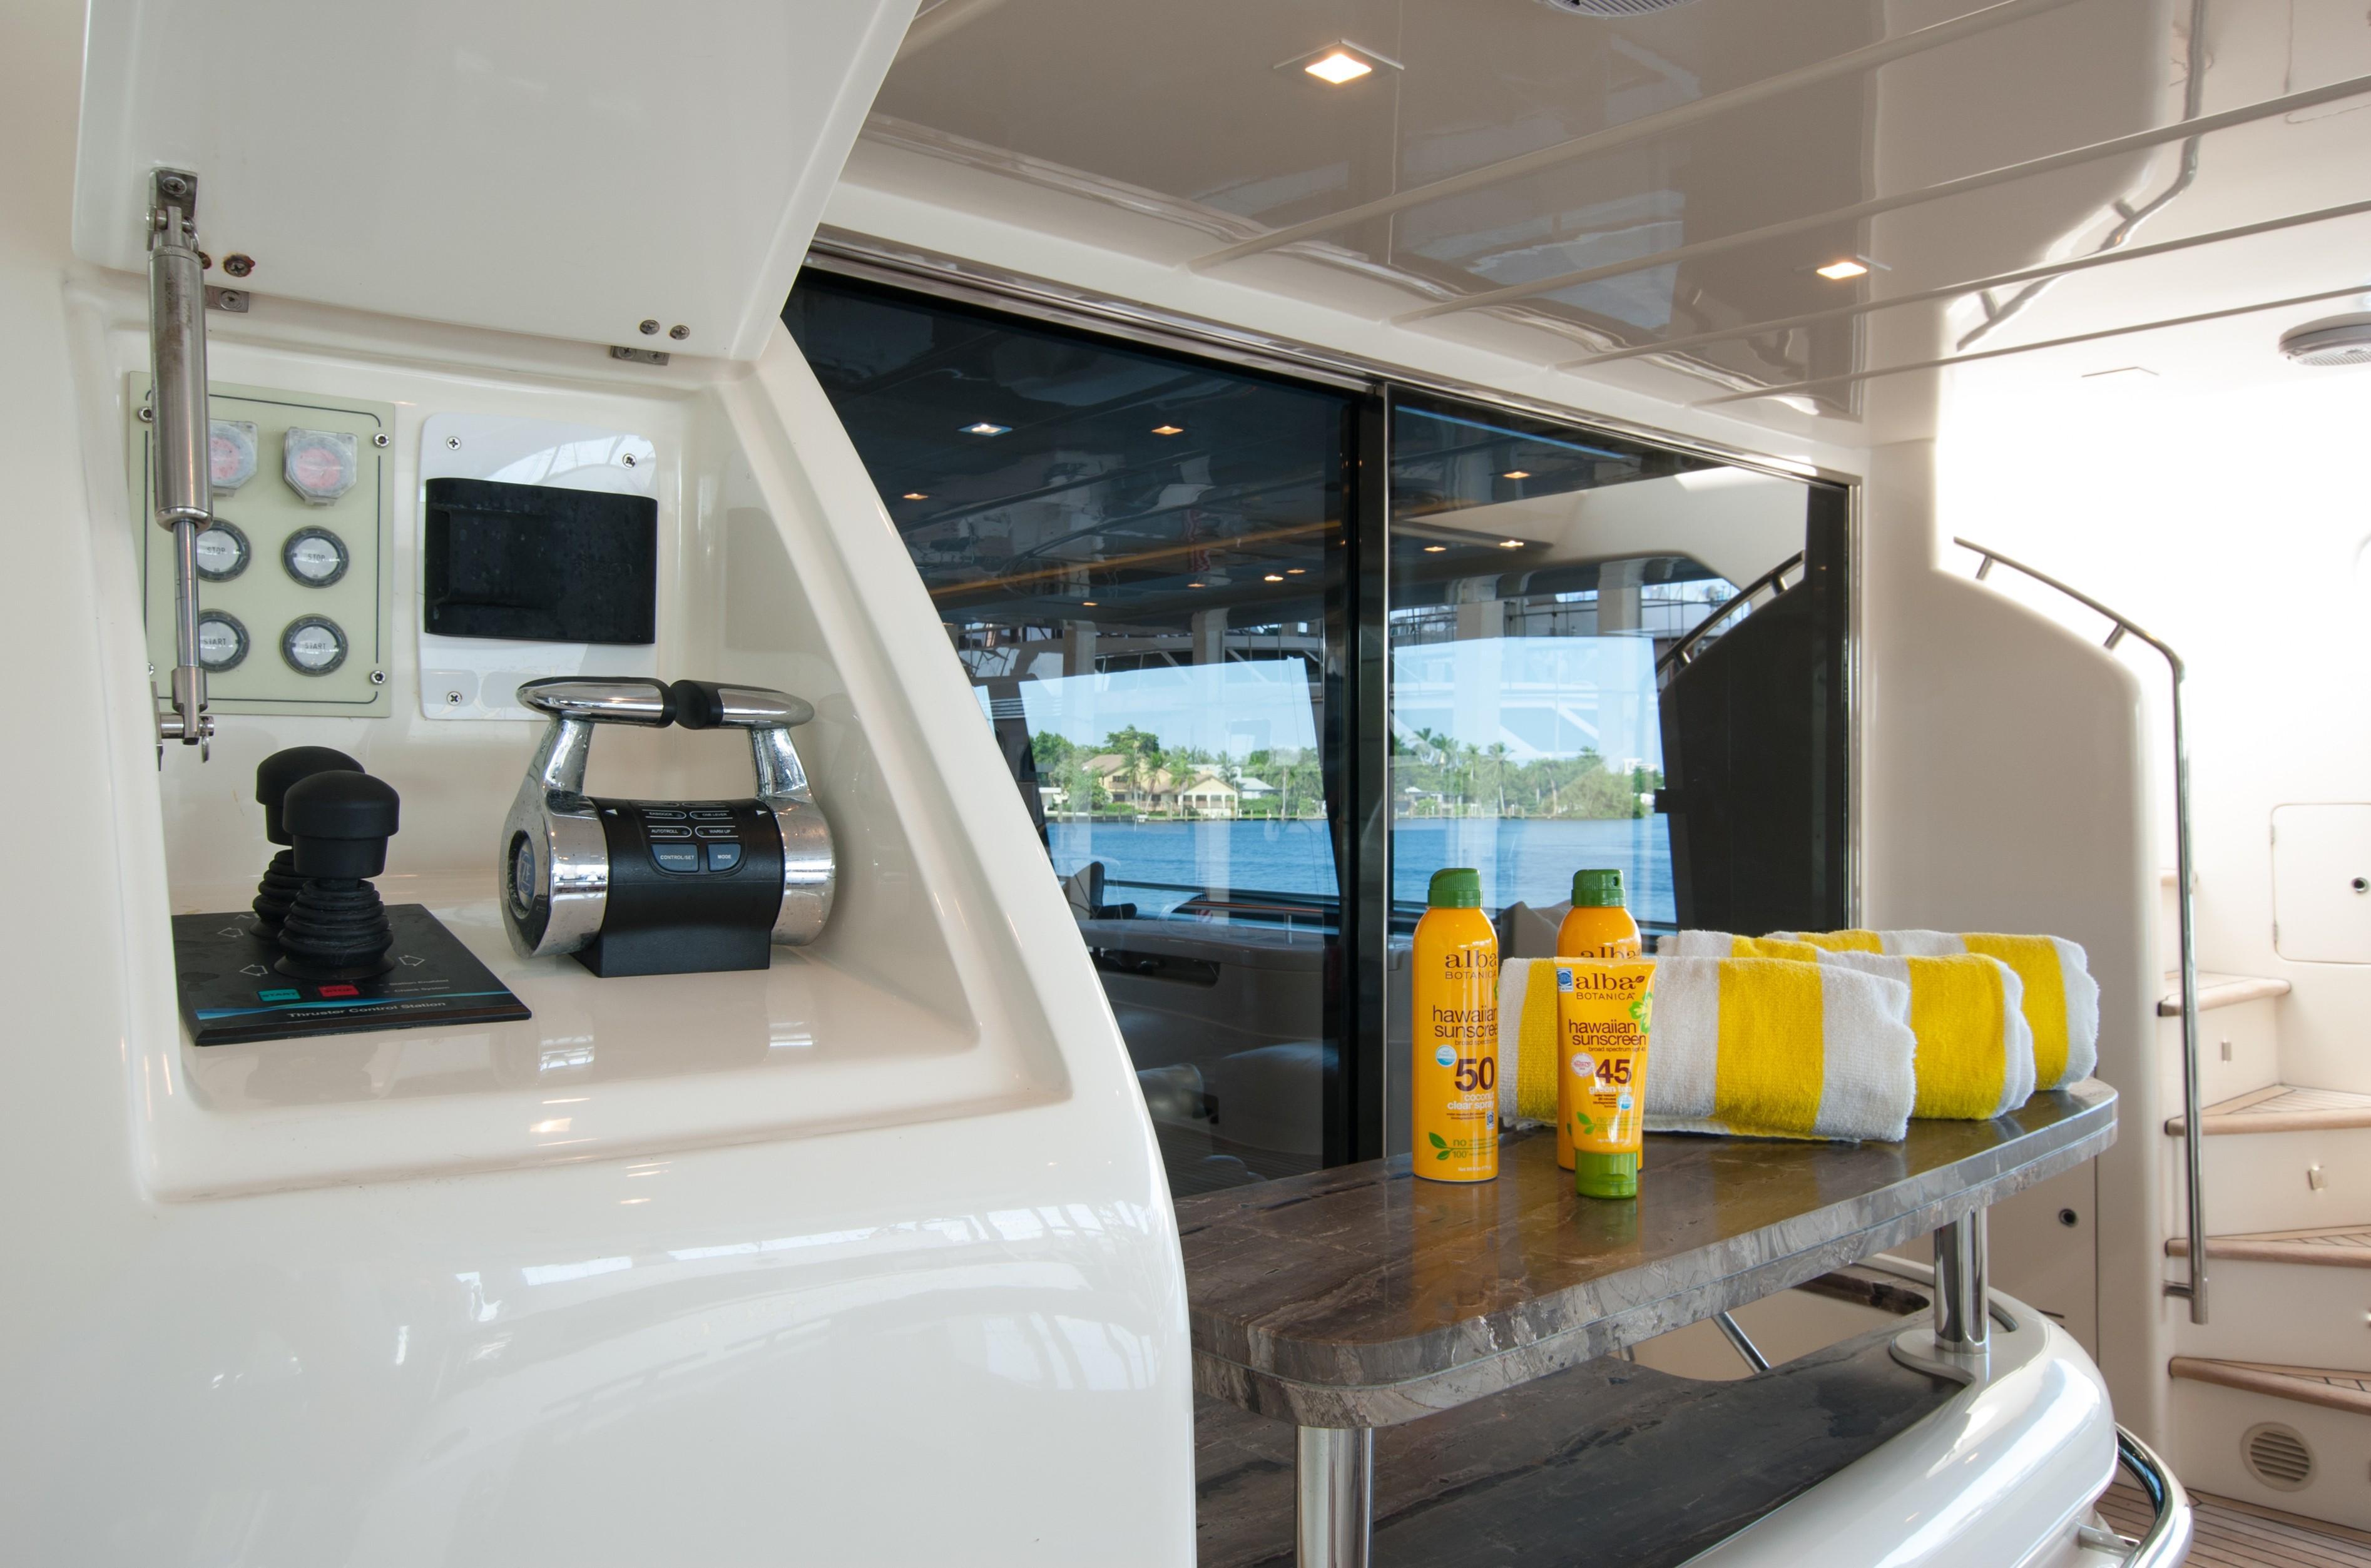 2014 870 Ferretti - Aft Deck Controls